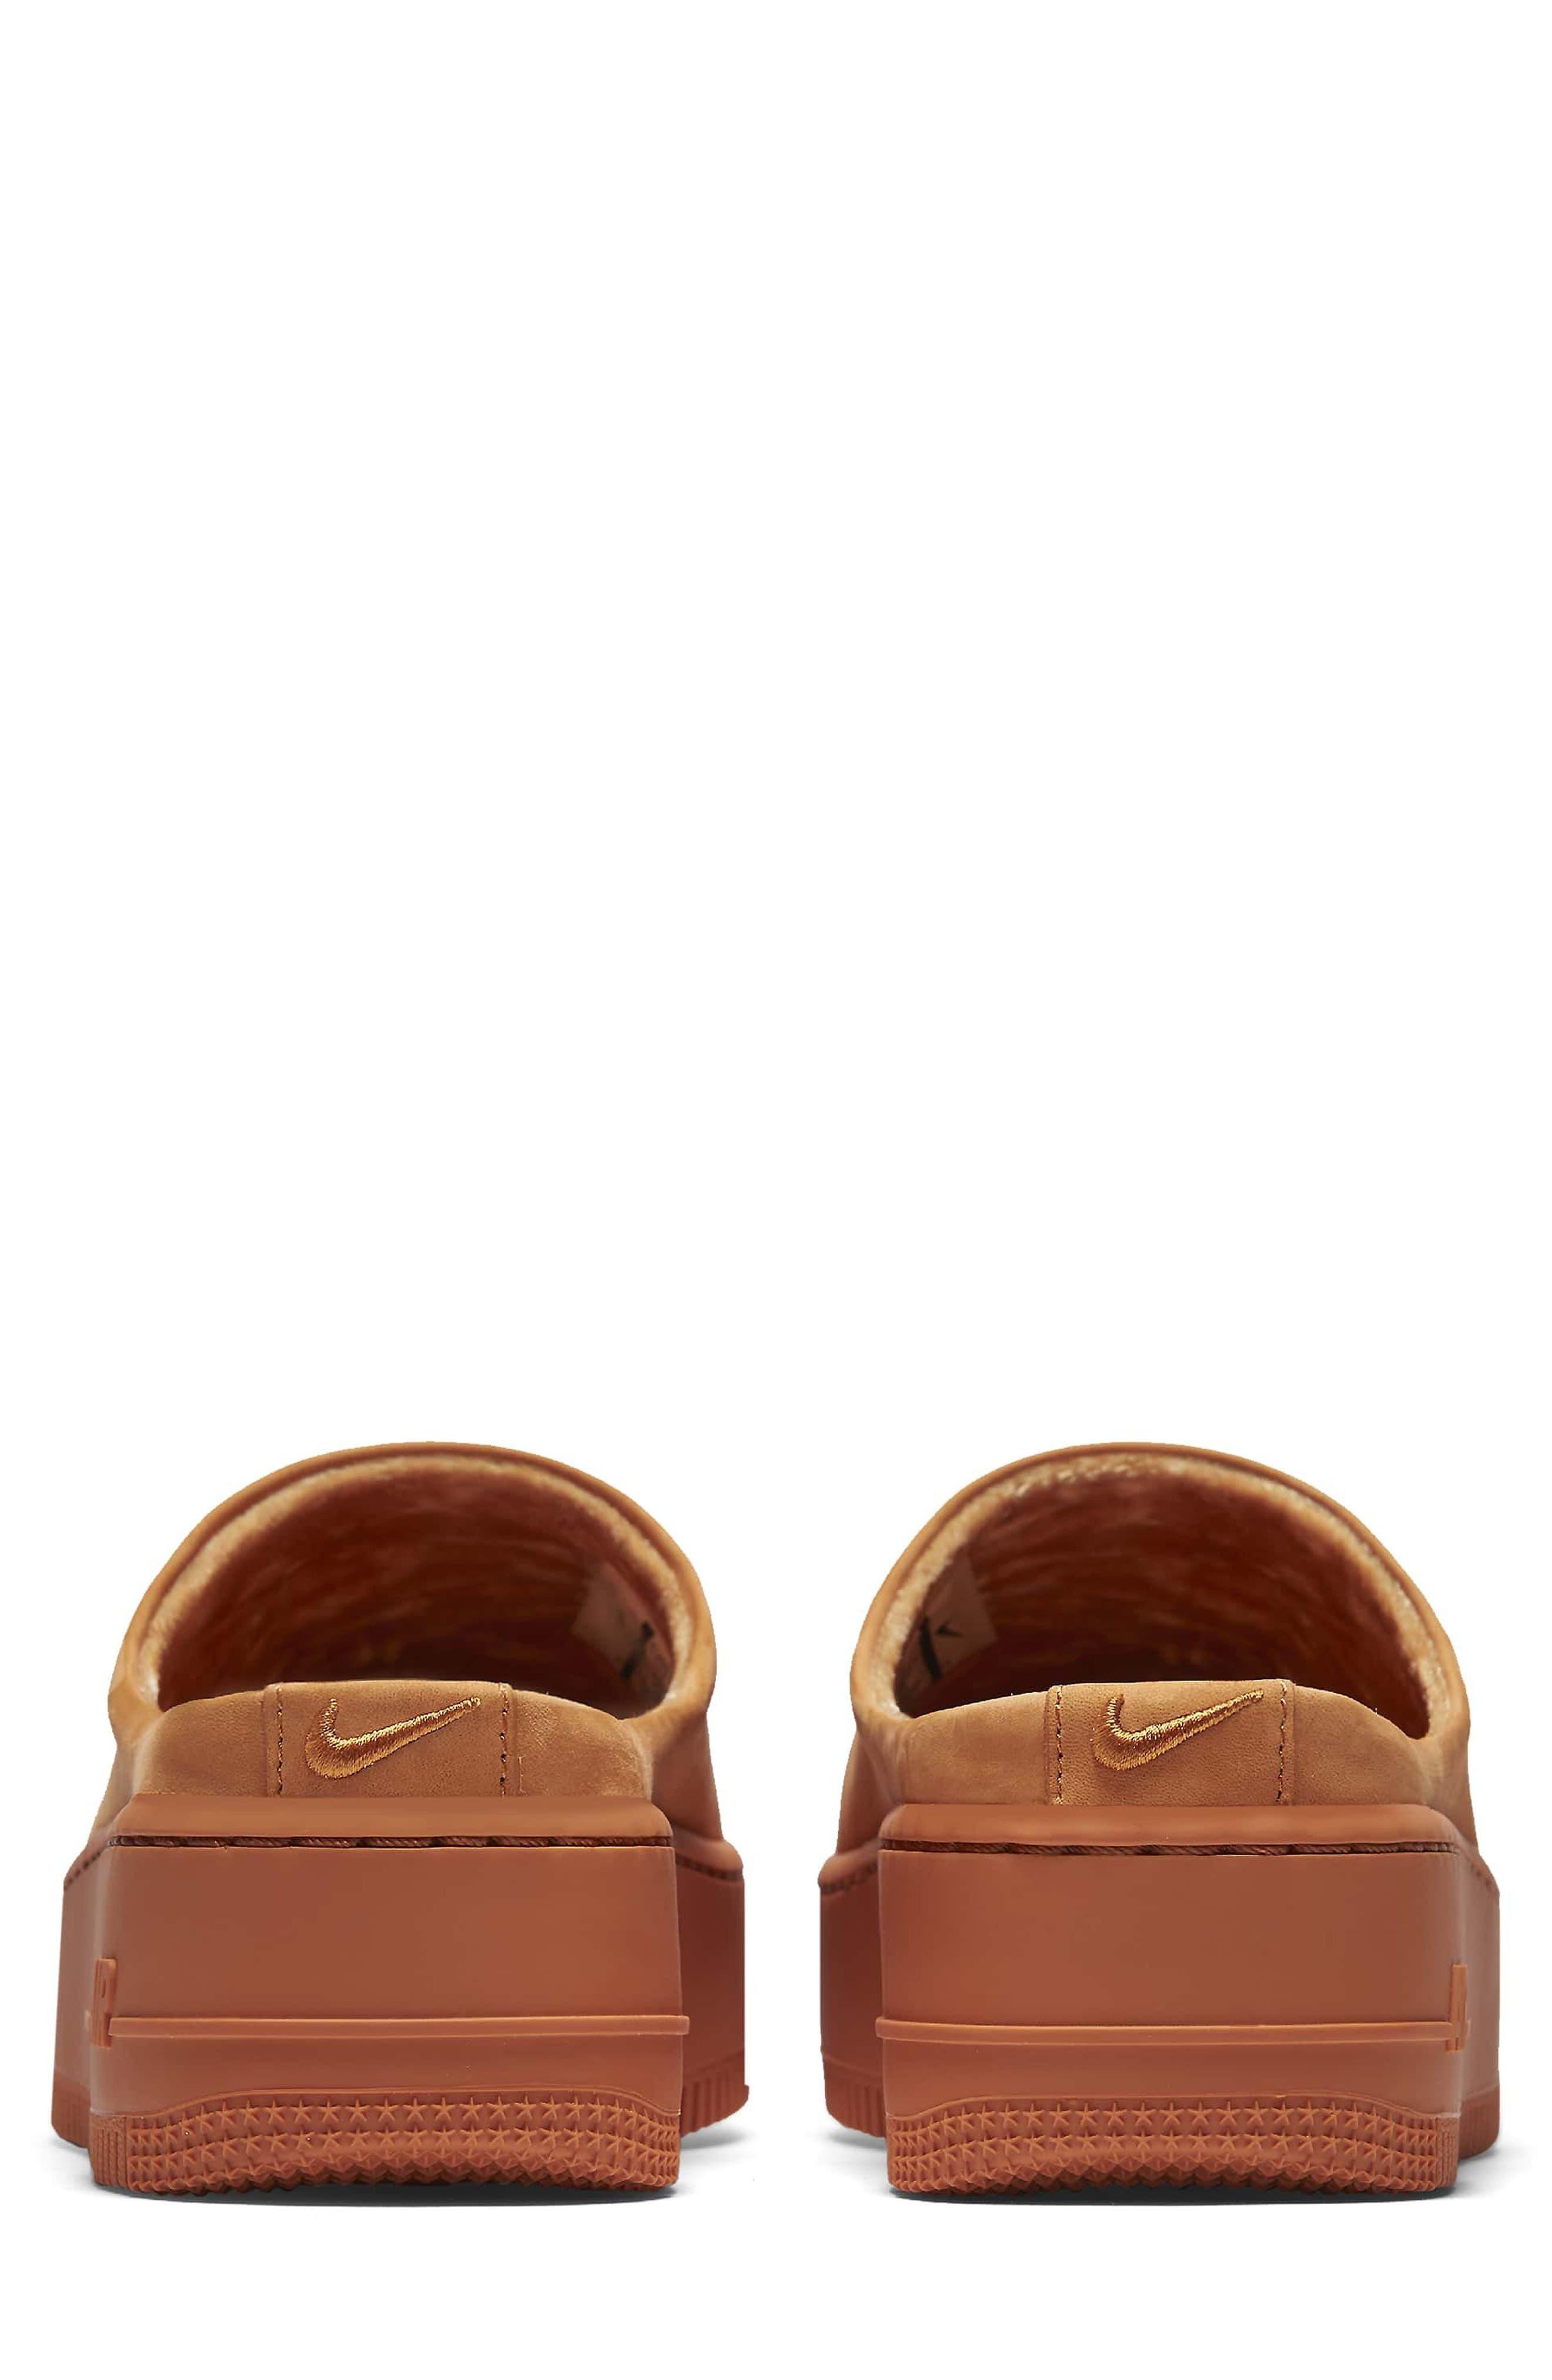 Air Force 1 Lover XX Slip-On Mule Sneaker,                             Alternate thumbnail 4, color,